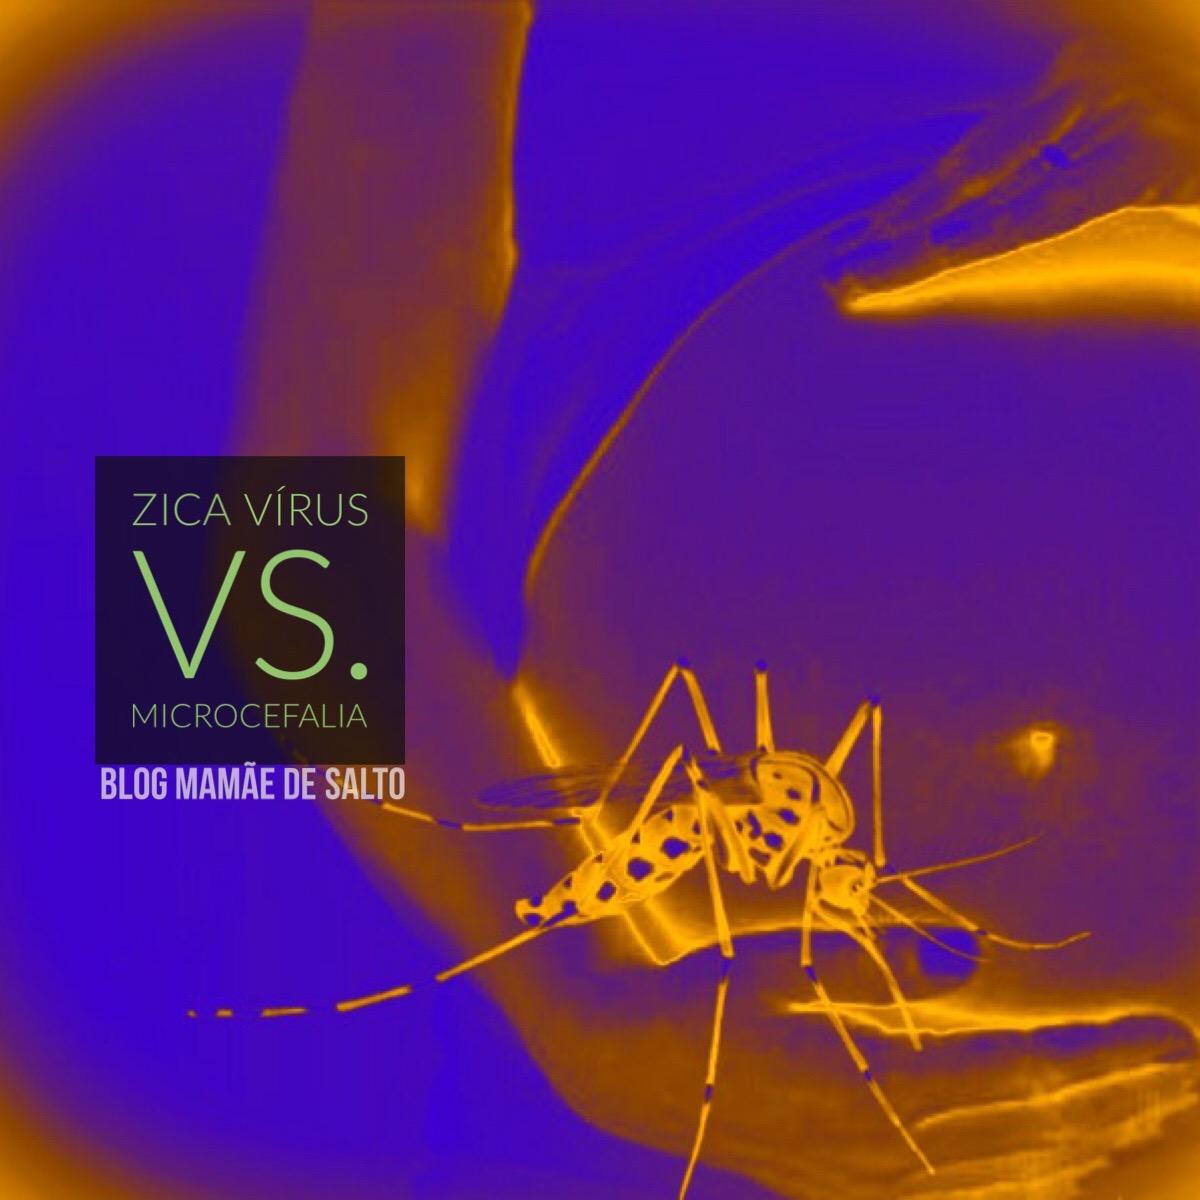 dúvidas sobre a microcefalia e o zika vírus ... blog Mamãe de Salto